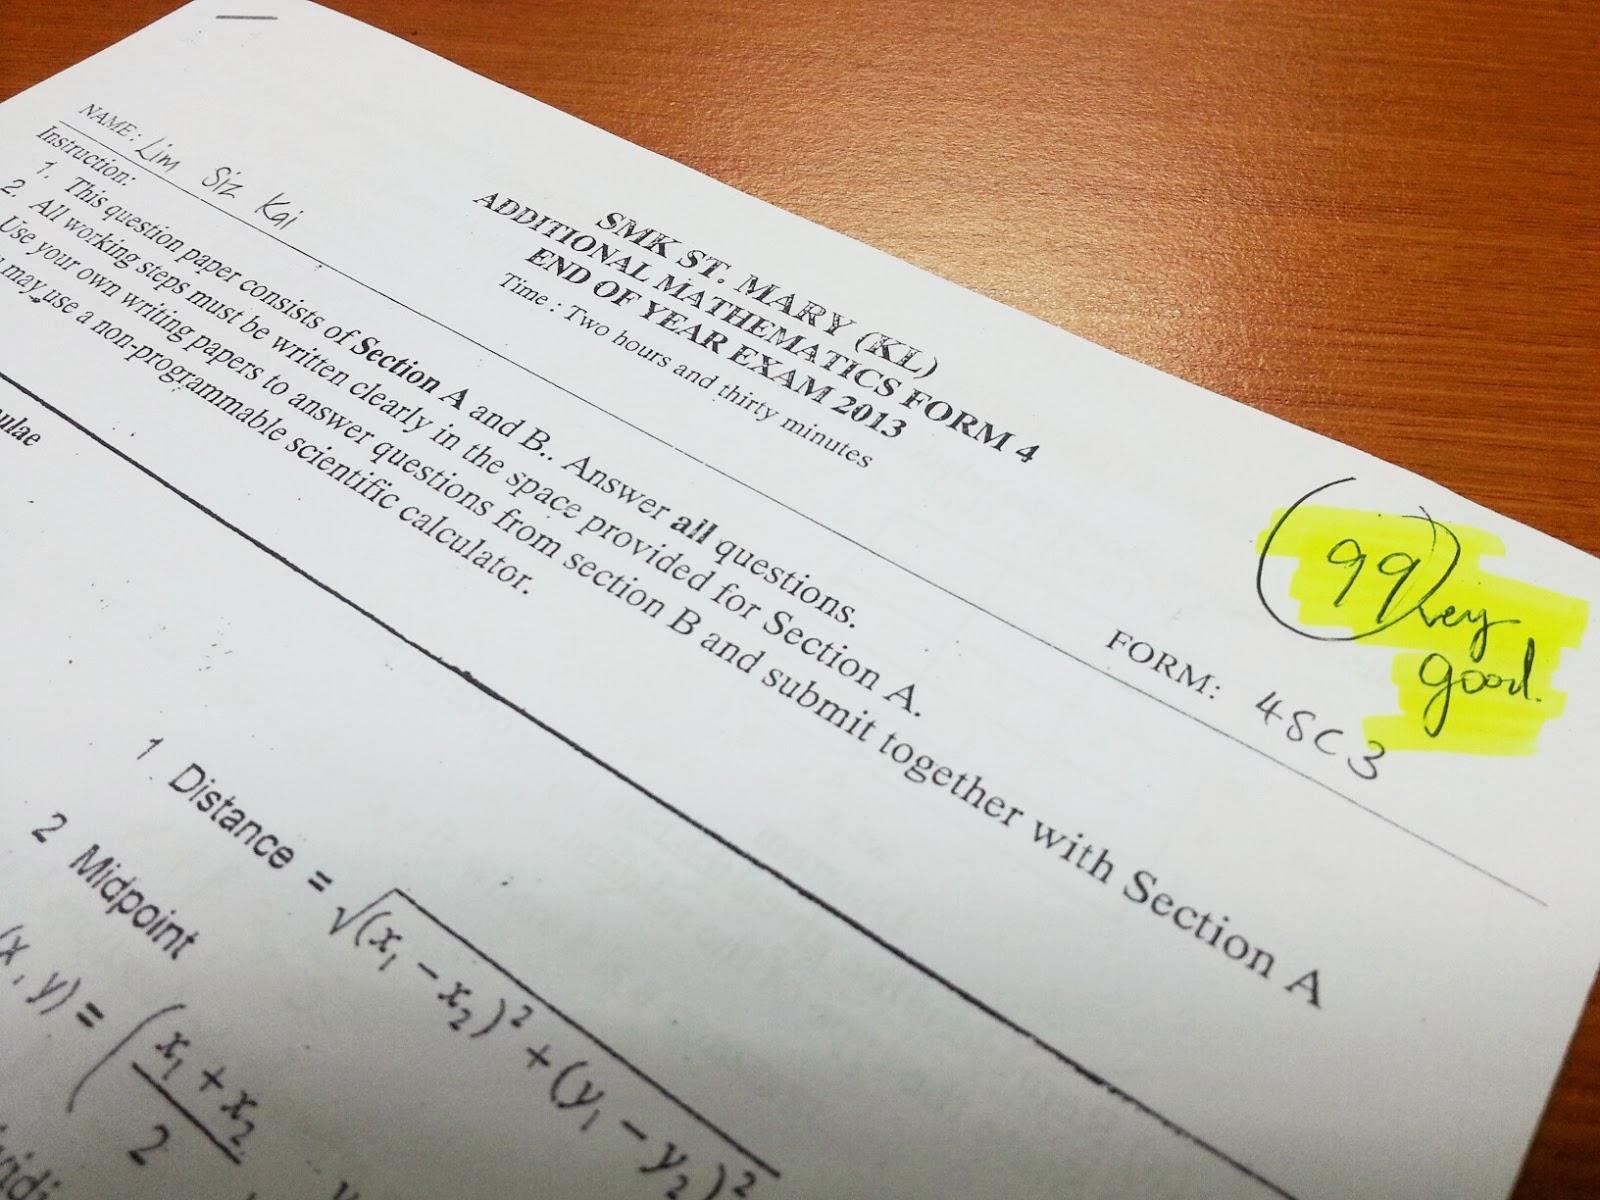 igcse additional mathematics past papers Cambridge igcse mathematics - additional (0606) past papers june 2014 question paper 22 (pdf, 428kb) june 2014 mark scheme 22 (pdf, 613kb.